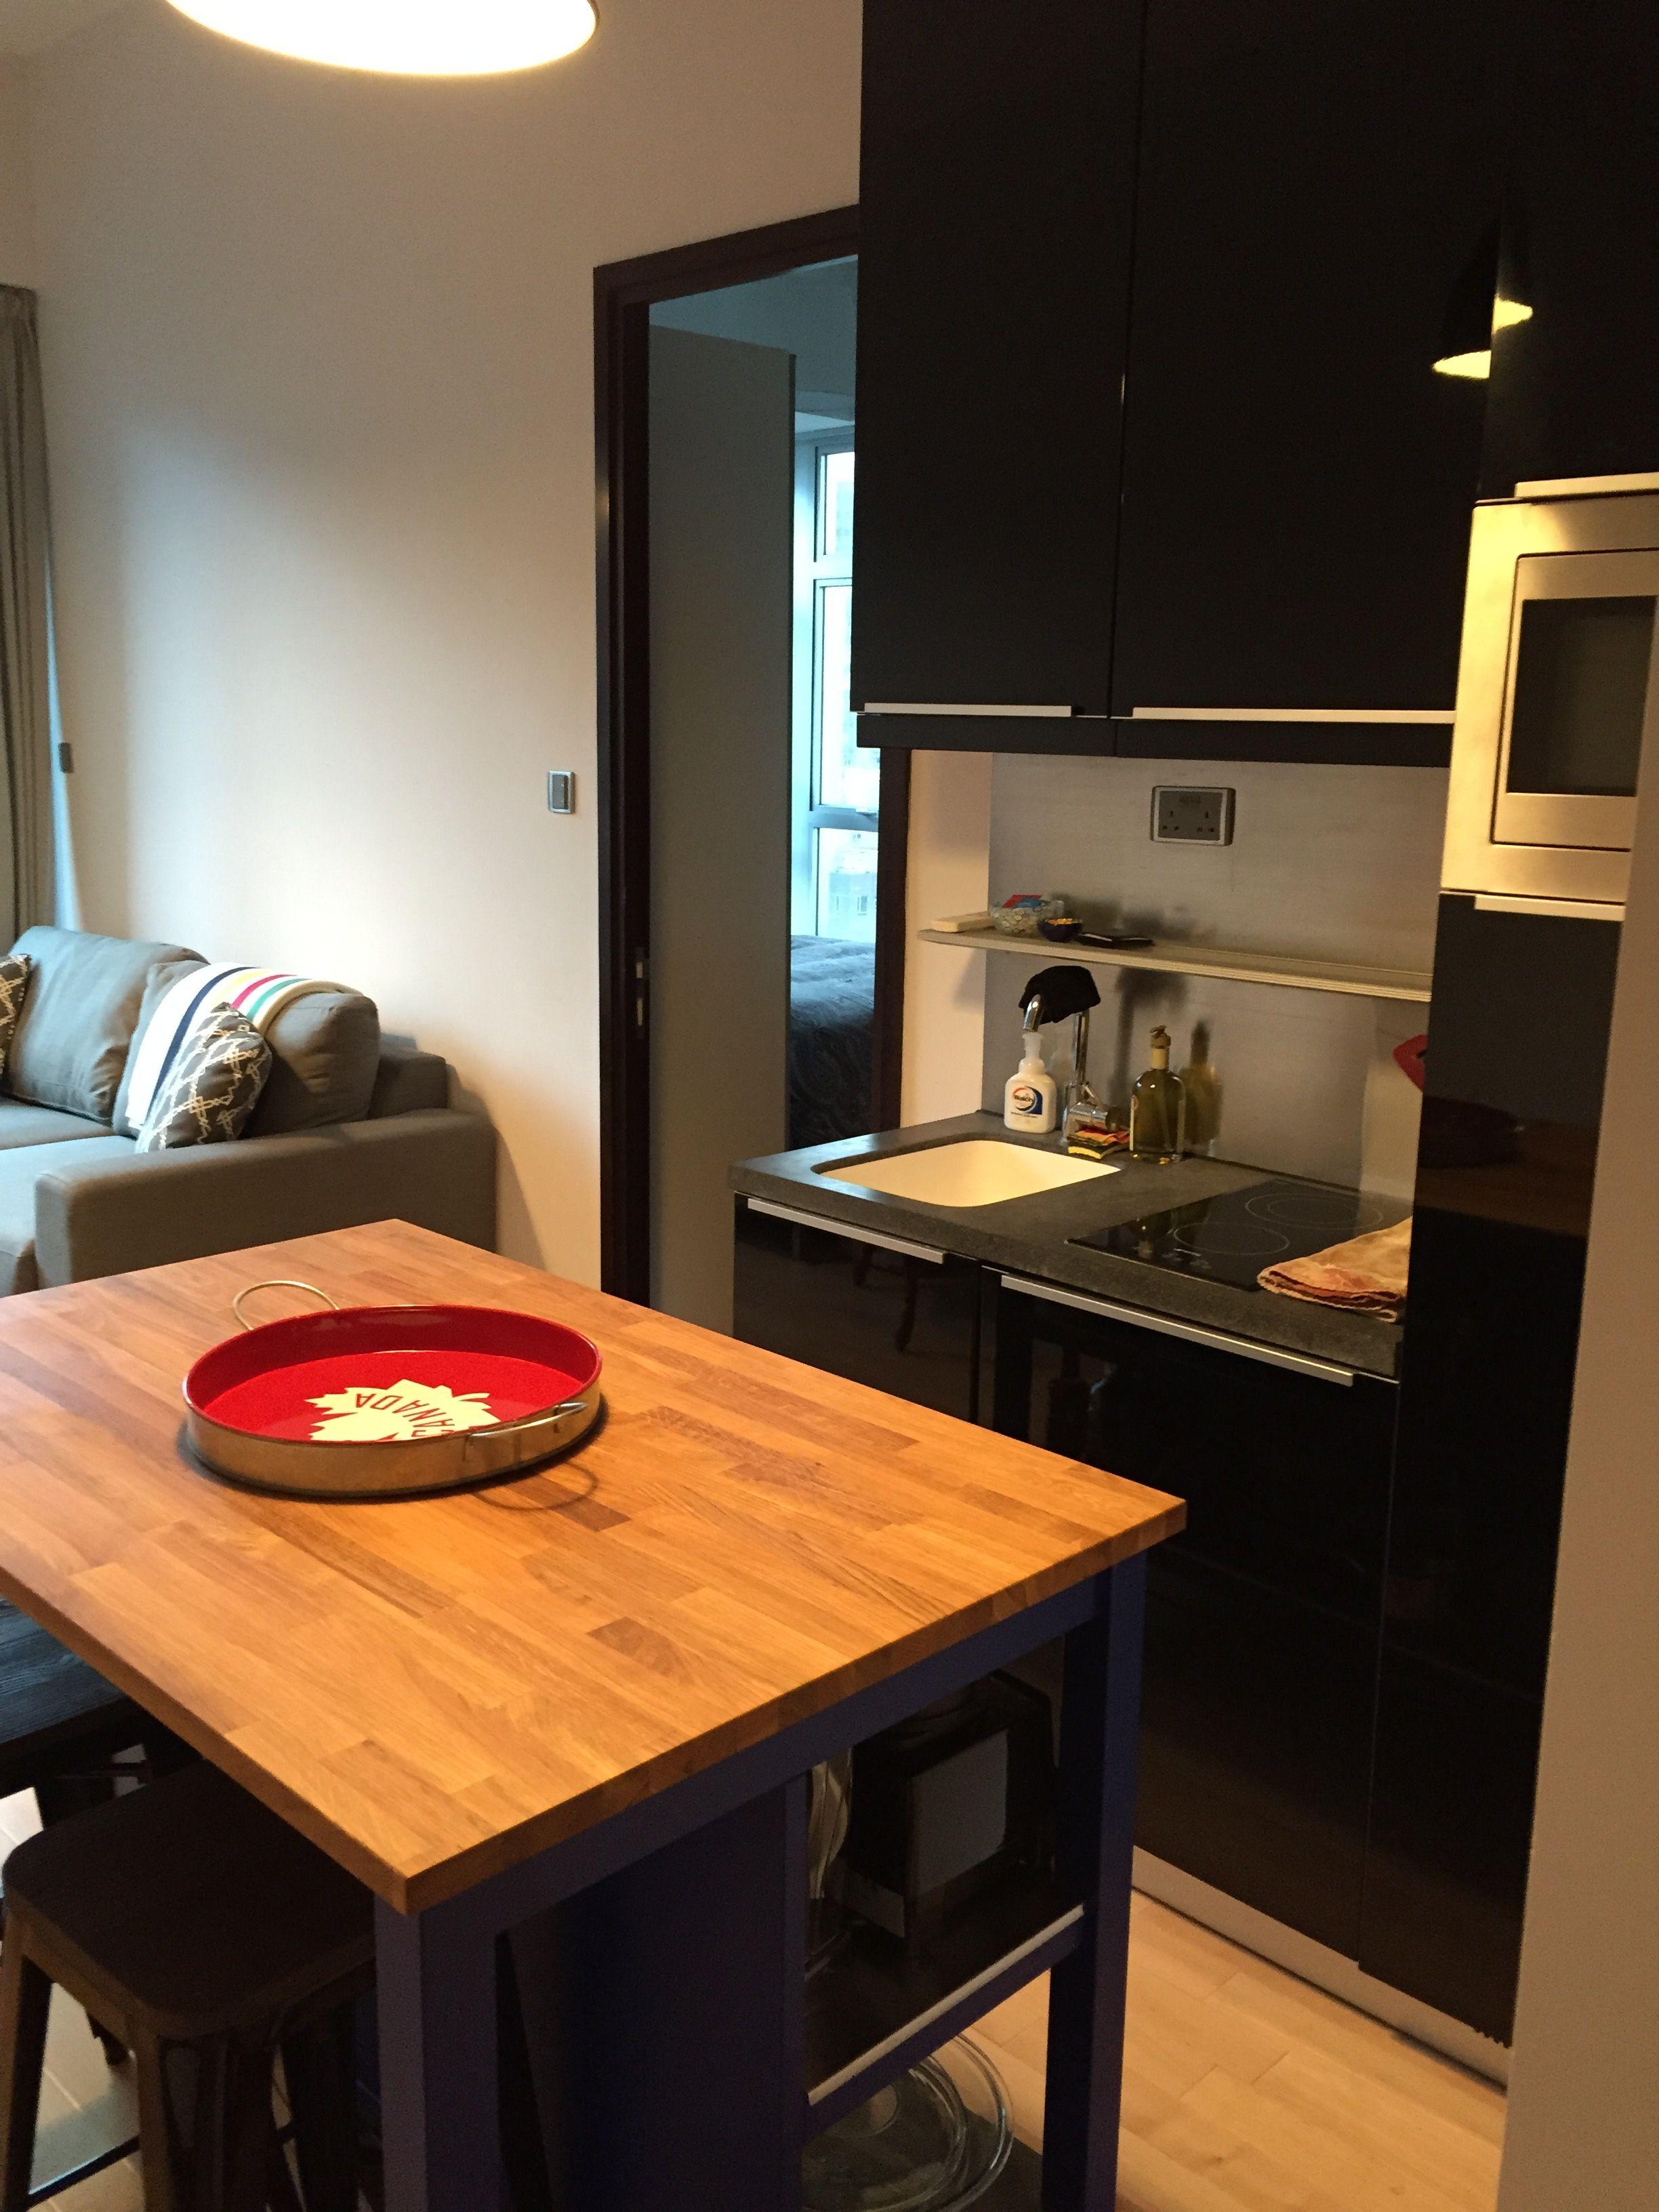 440 sq ft apartment kitchen (Ikea Stenstorp) - Hong Kong Apartment ...